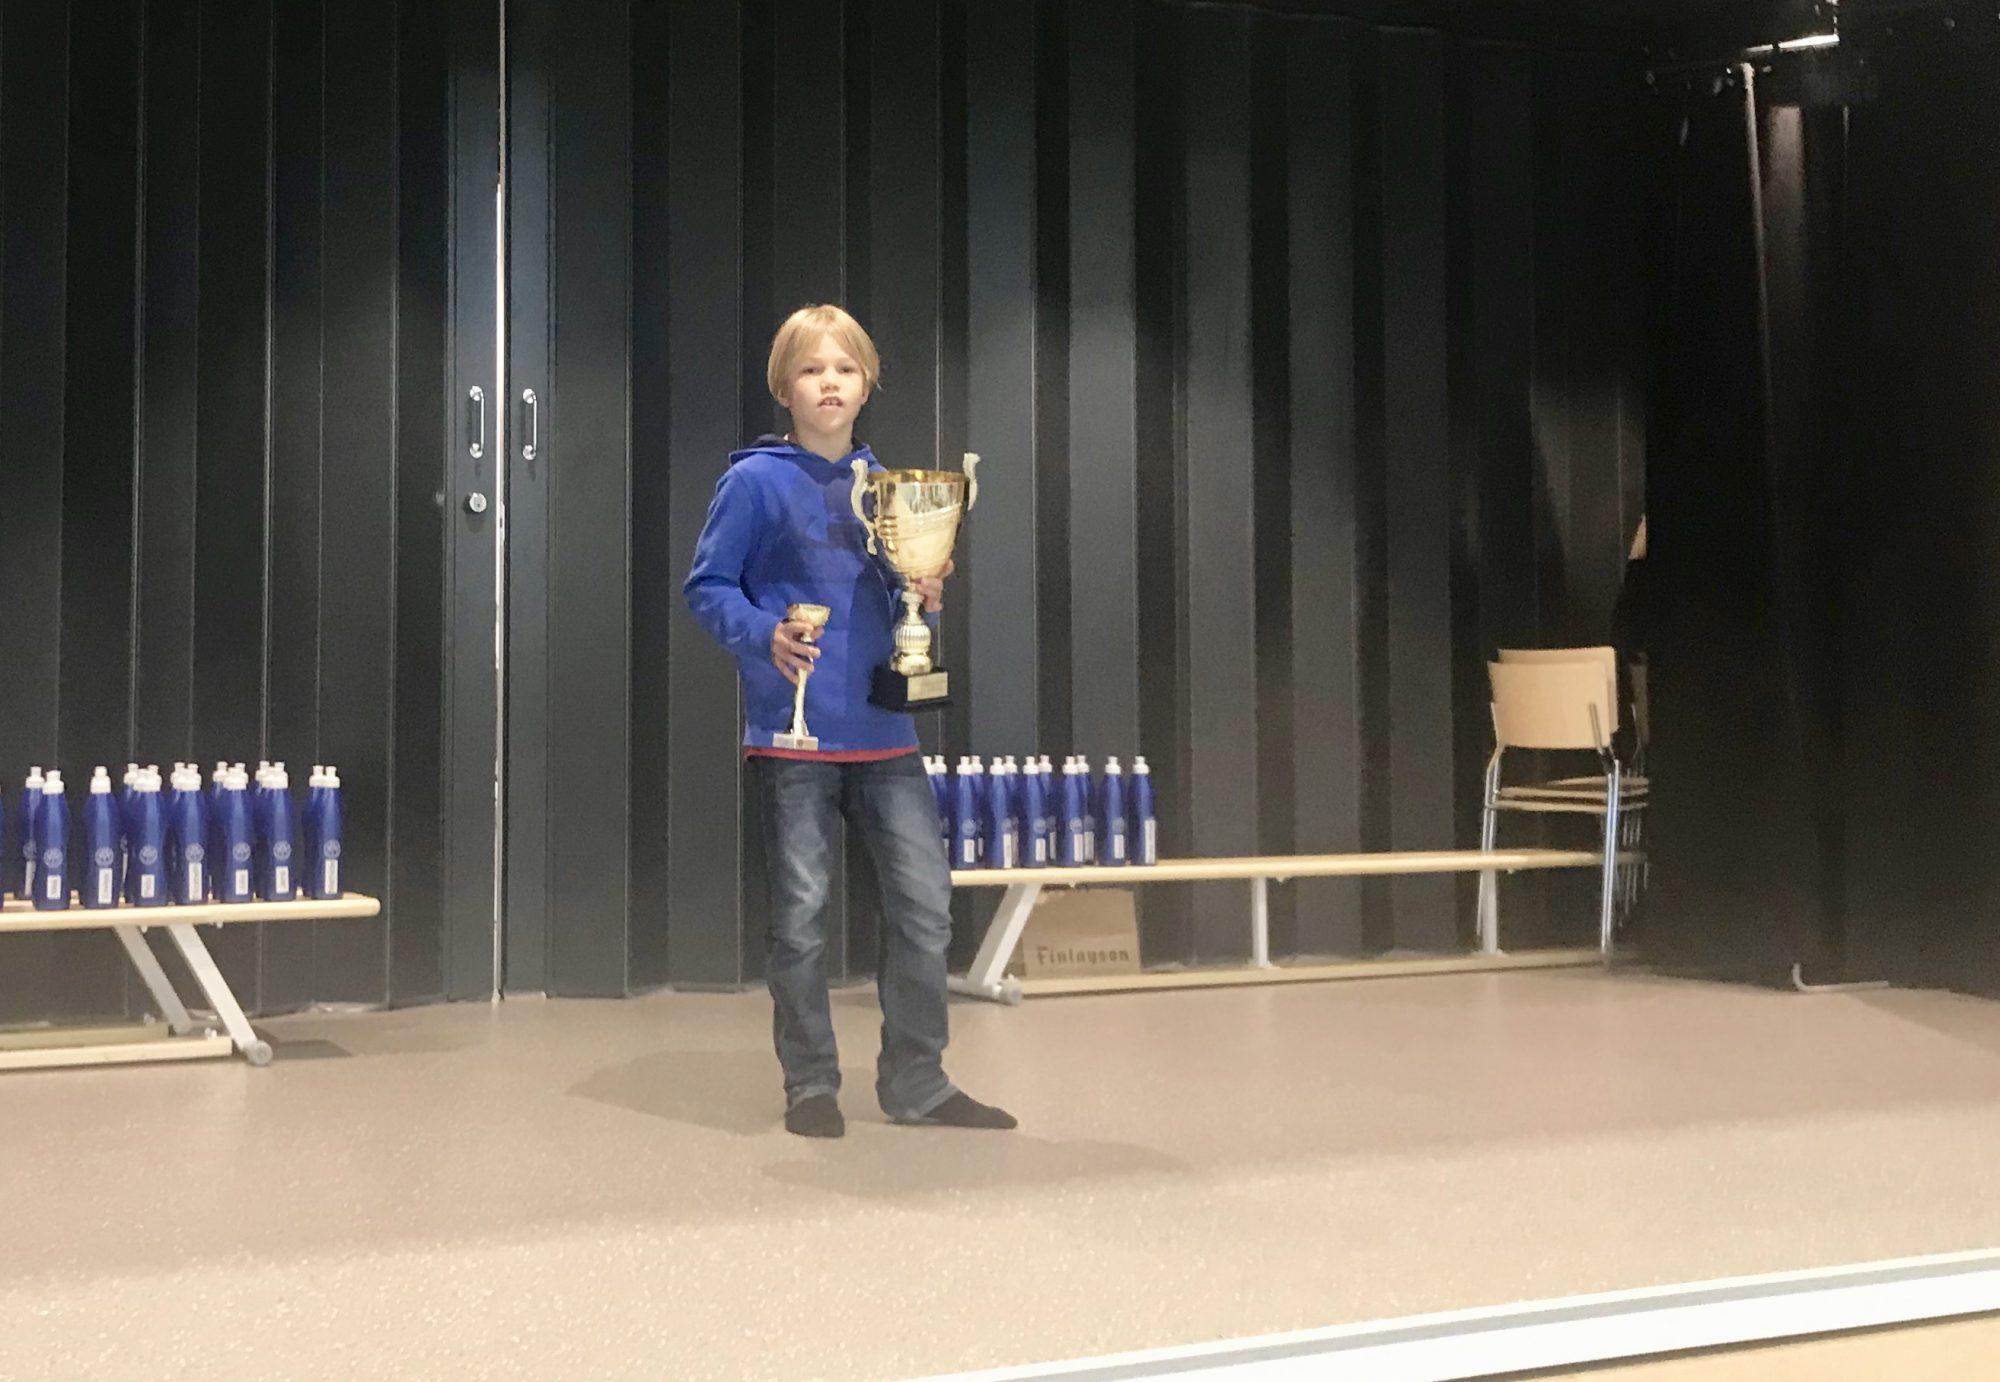 Knattepokalen pristagare 2018